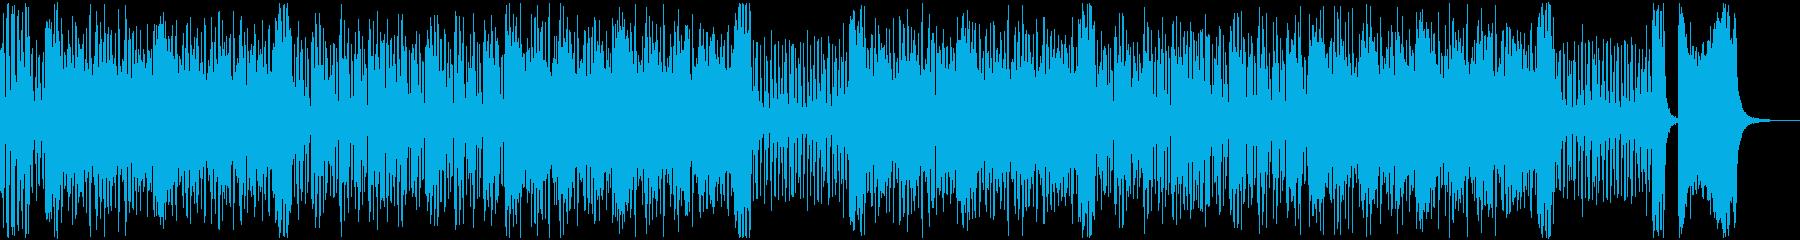 【YouTube】ハプニング!?なジャズの再生済みの波形